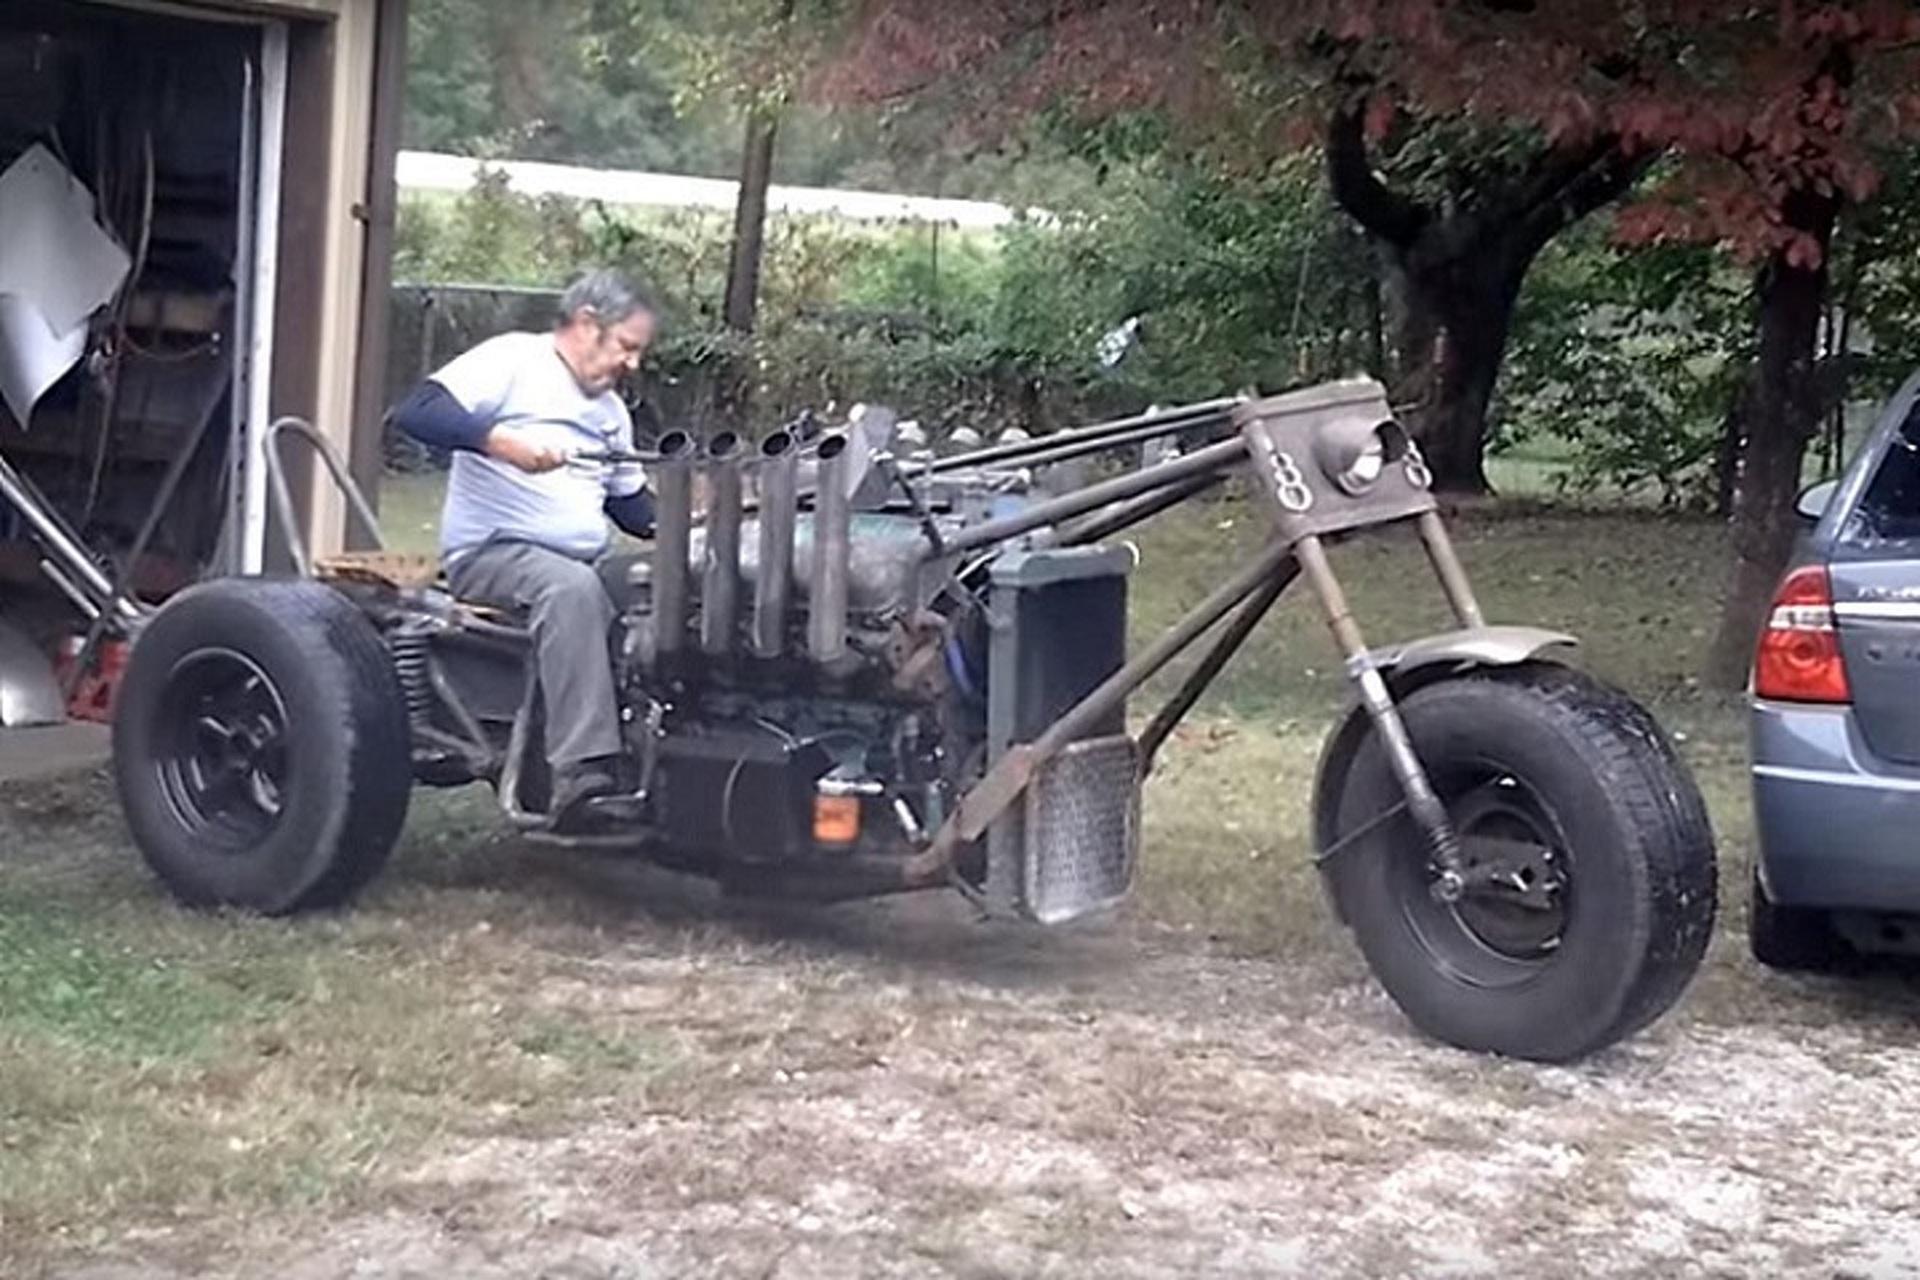 Dsytopian Custom Trike Is the Next Mad Max Machine